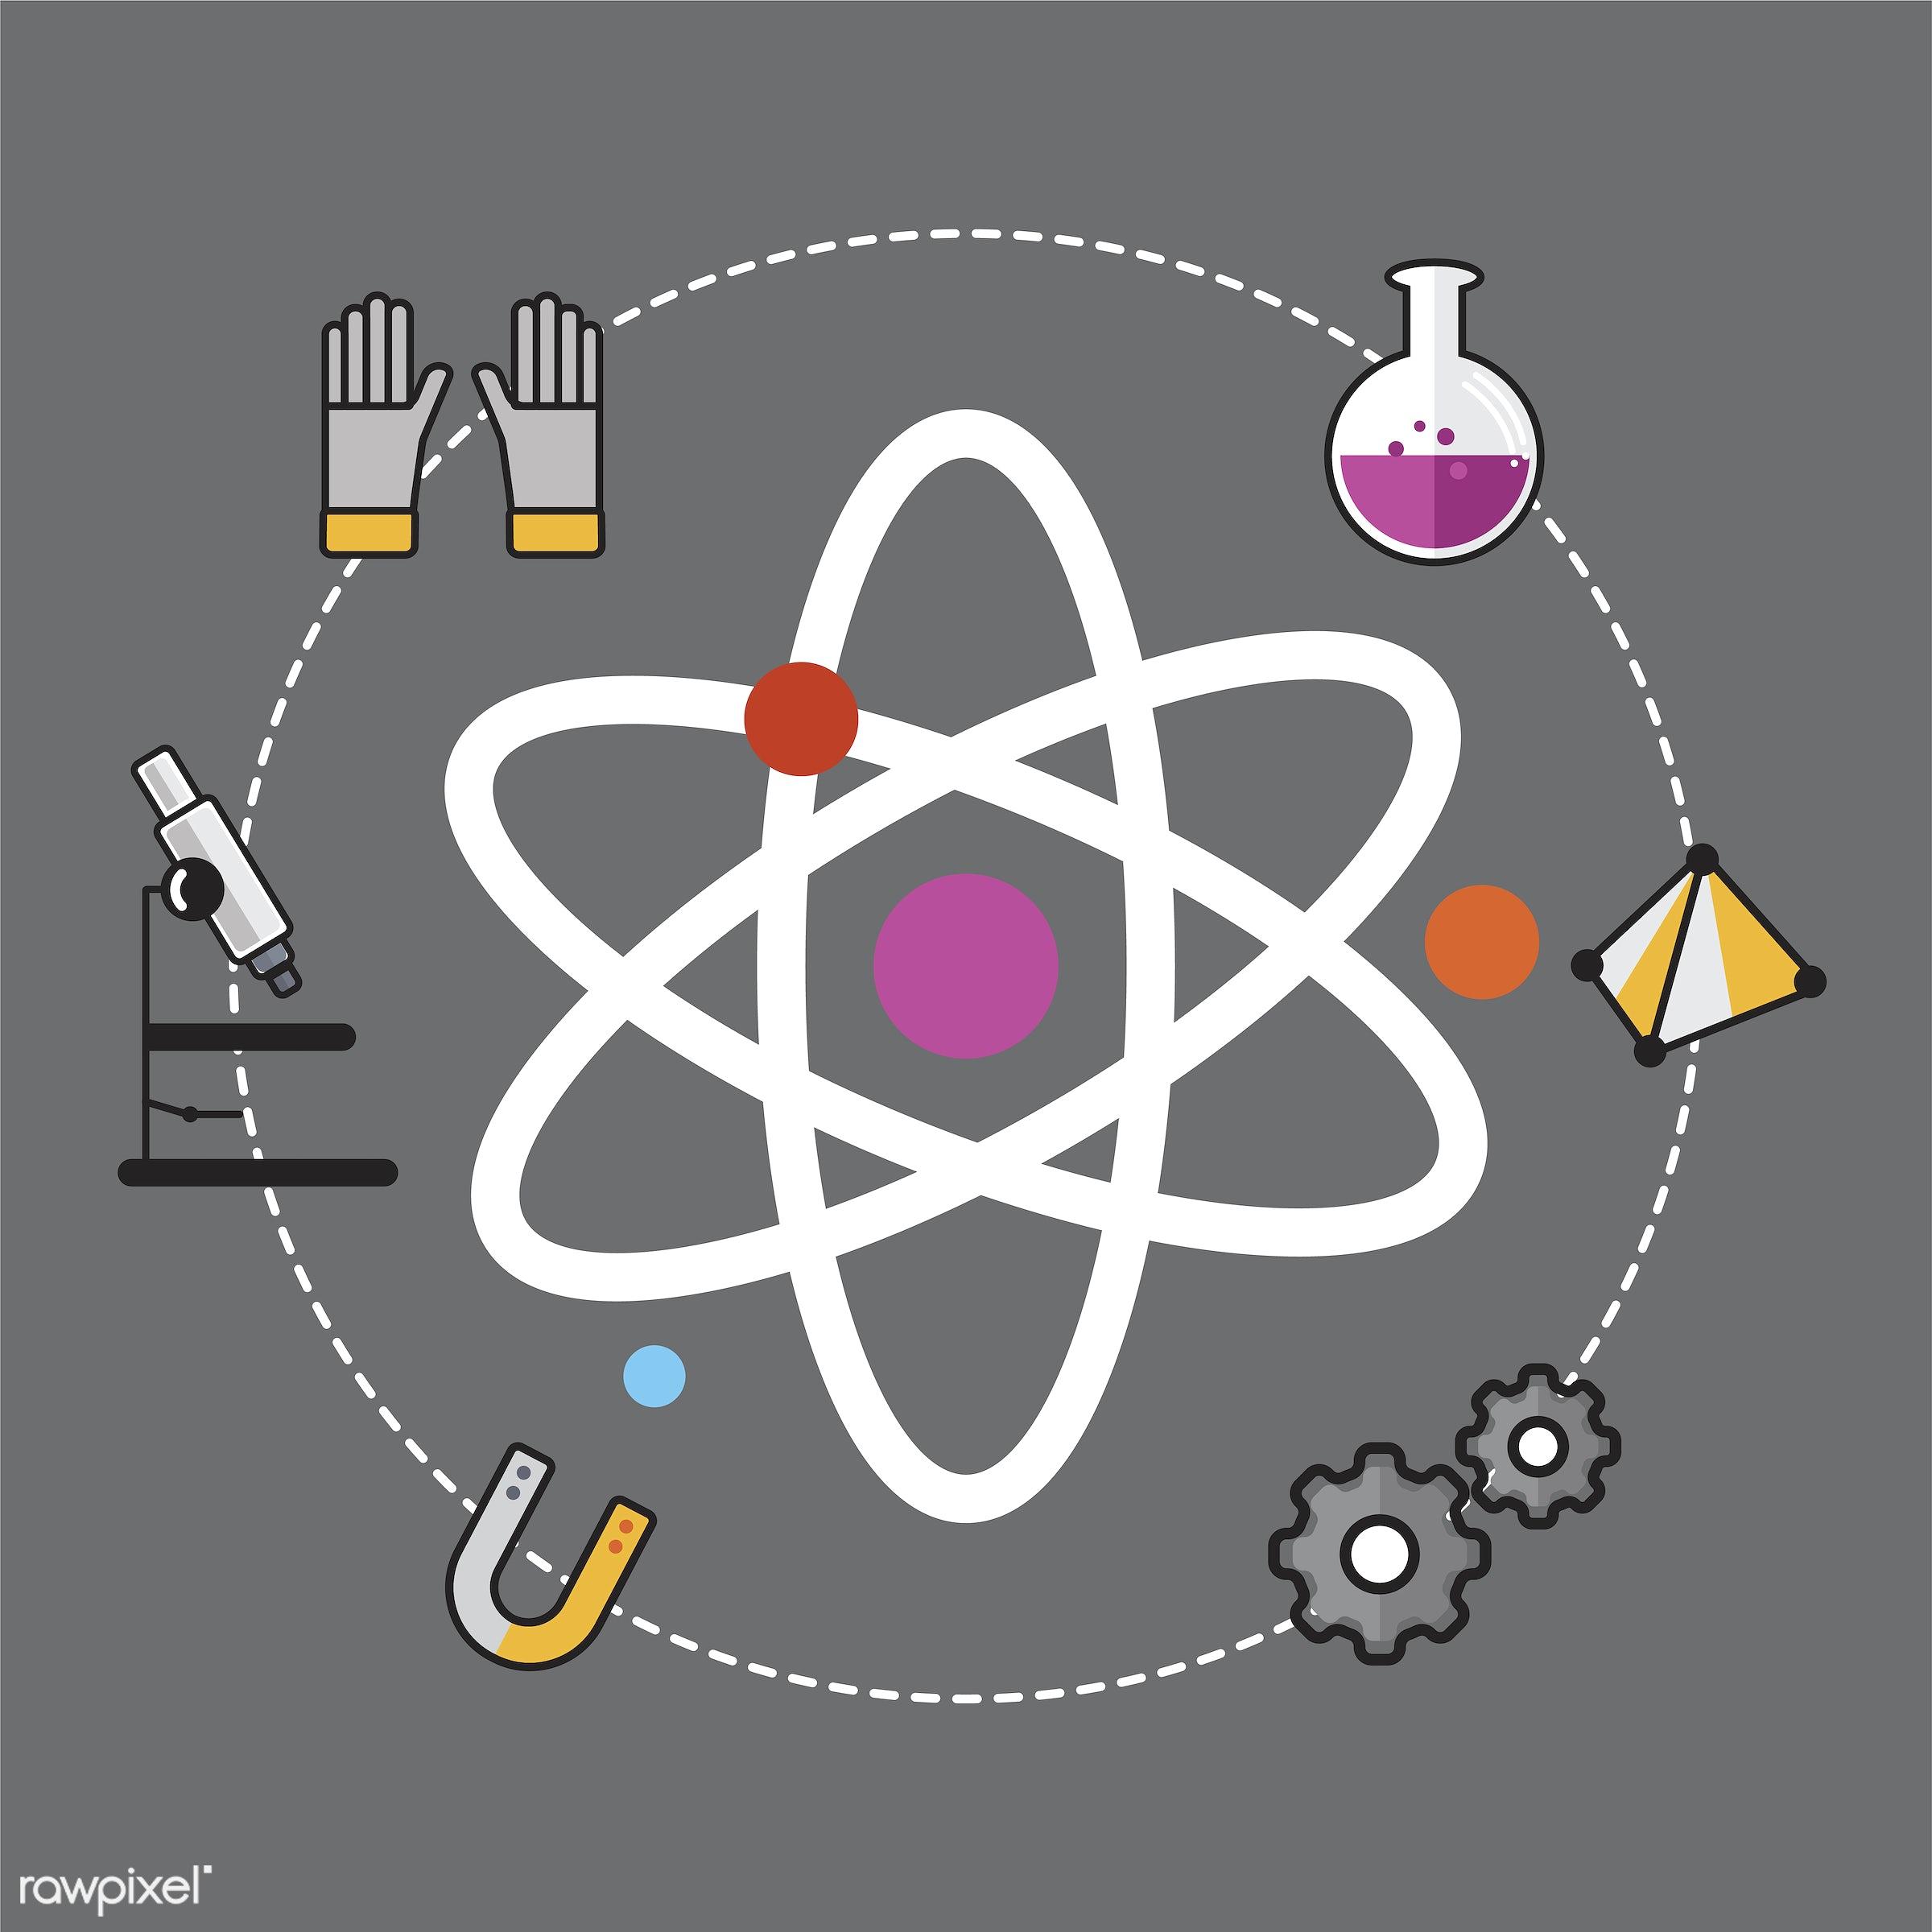 Illustration of  - biology, chemistry, class, design, education, equipments, graphic, icon, illustration, innovation,...